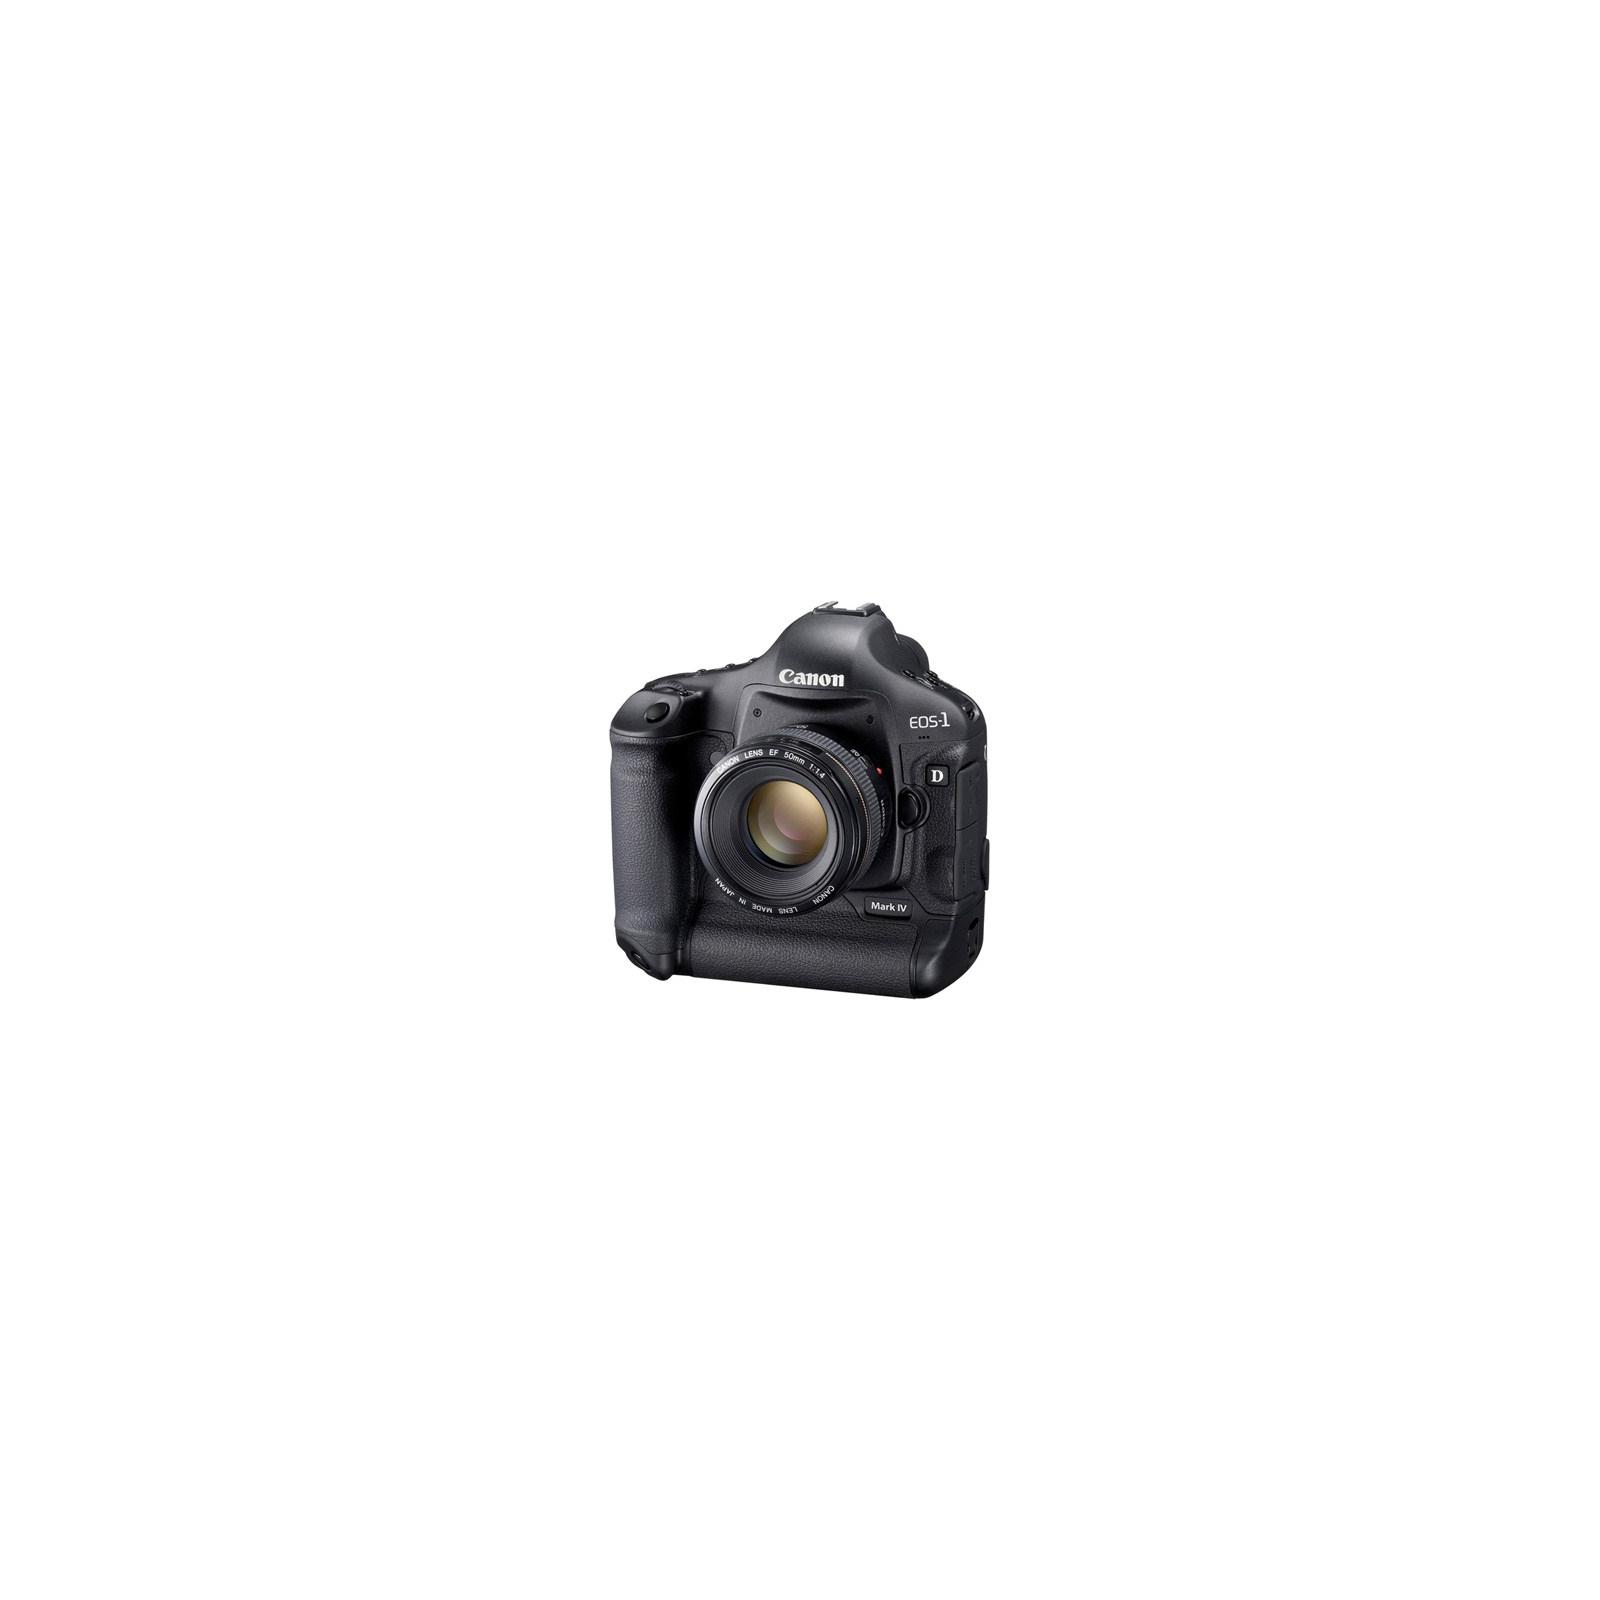 Цифровой фотоаппарат EOS 1D Mark IV body Canon (3822B020)